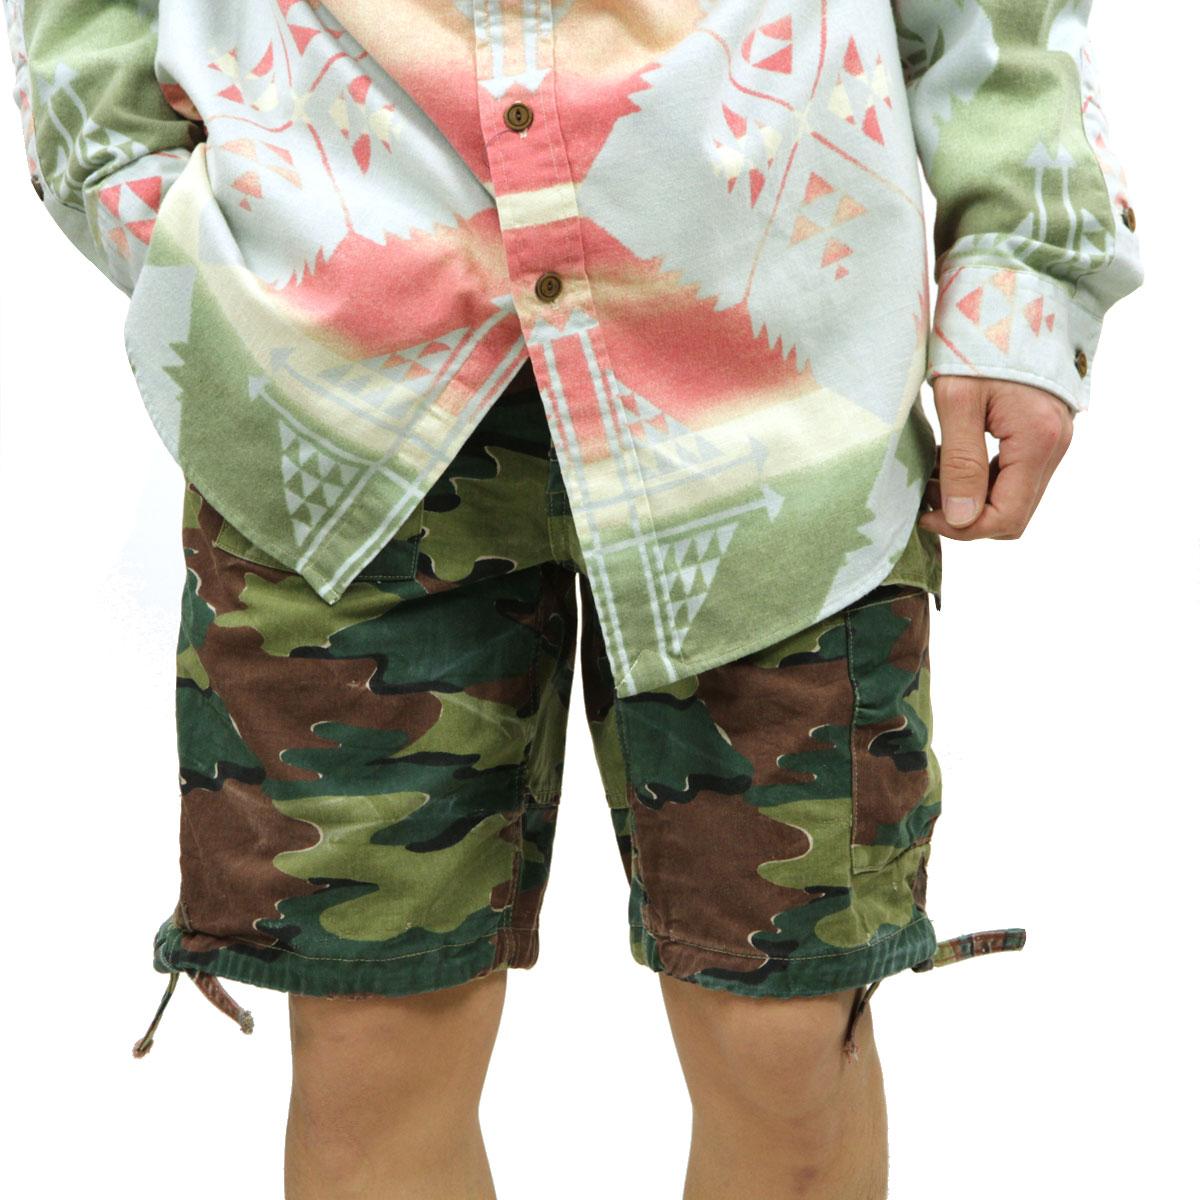 Lauren Pants Print Regular Camo Ralph Article Bottoms Corporal Short Polo Men's J1FTlKc